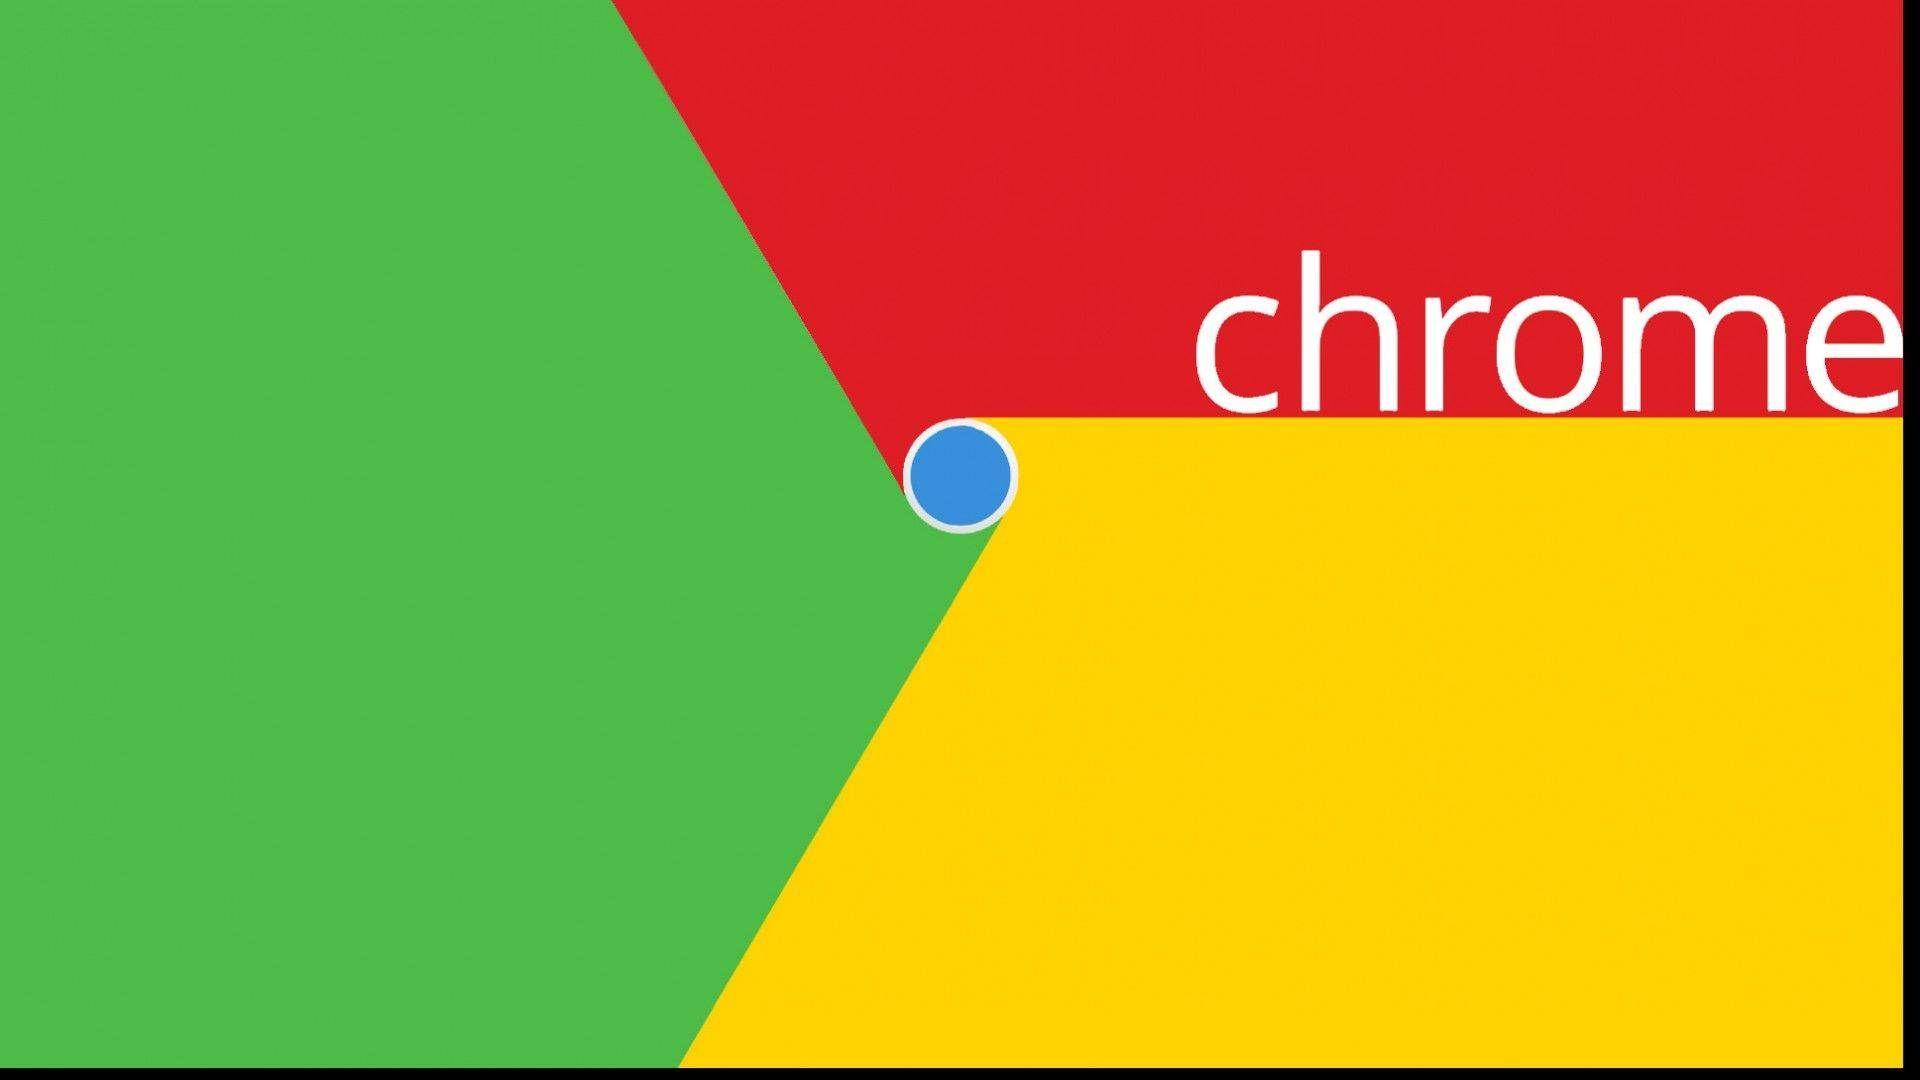 ChromeOS